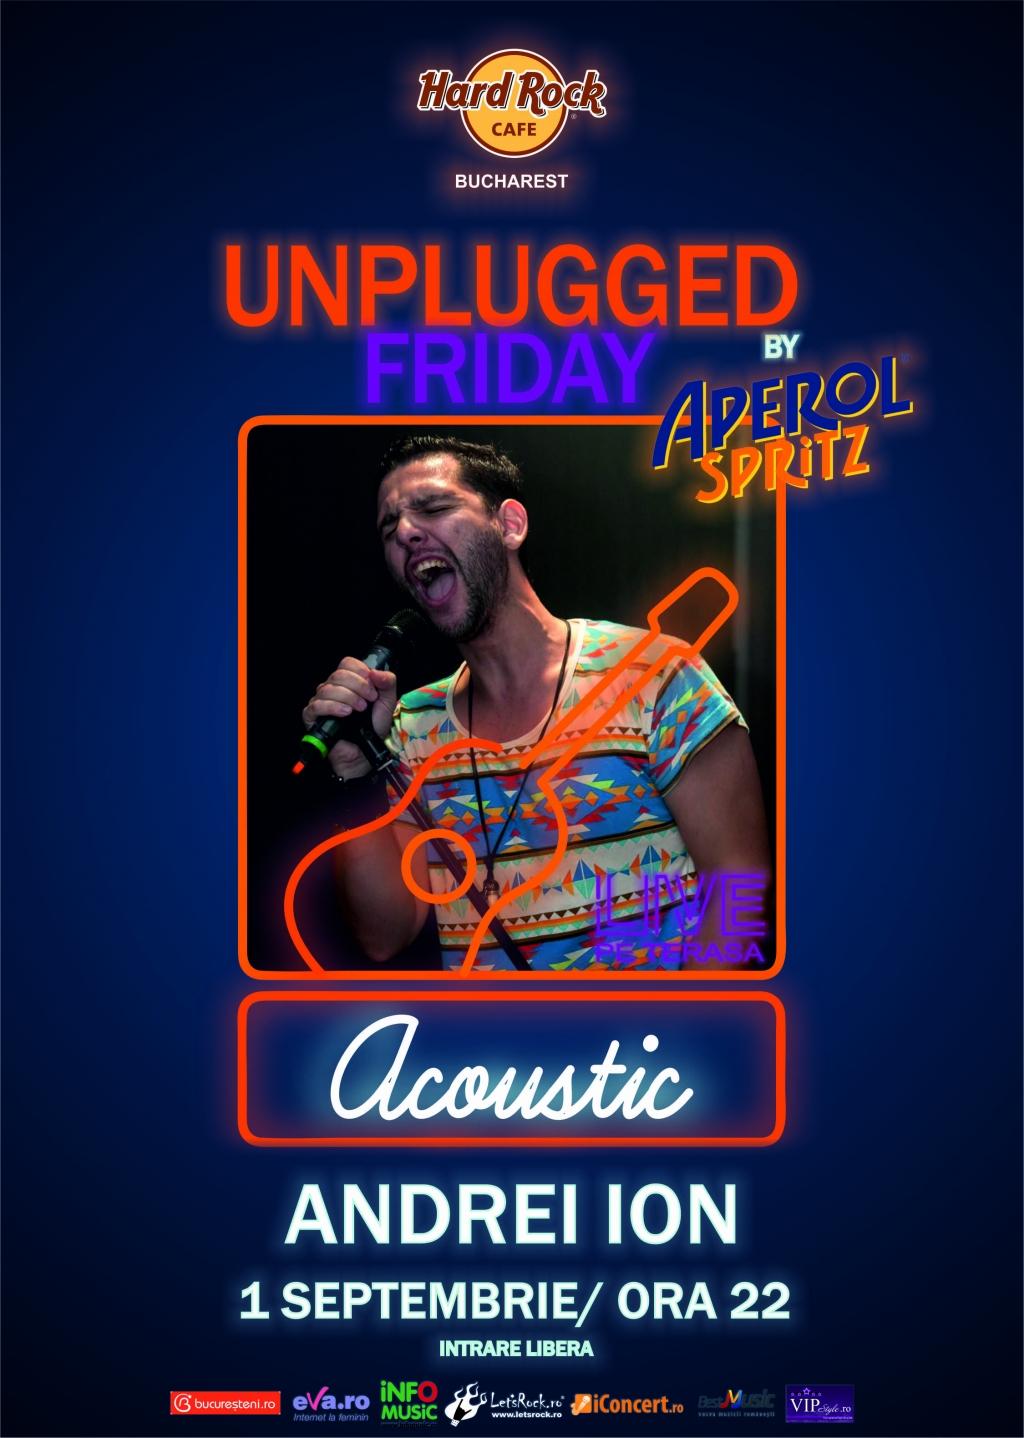 Unplugged Friday cu Andrei Ion la Hard Rock Cafe